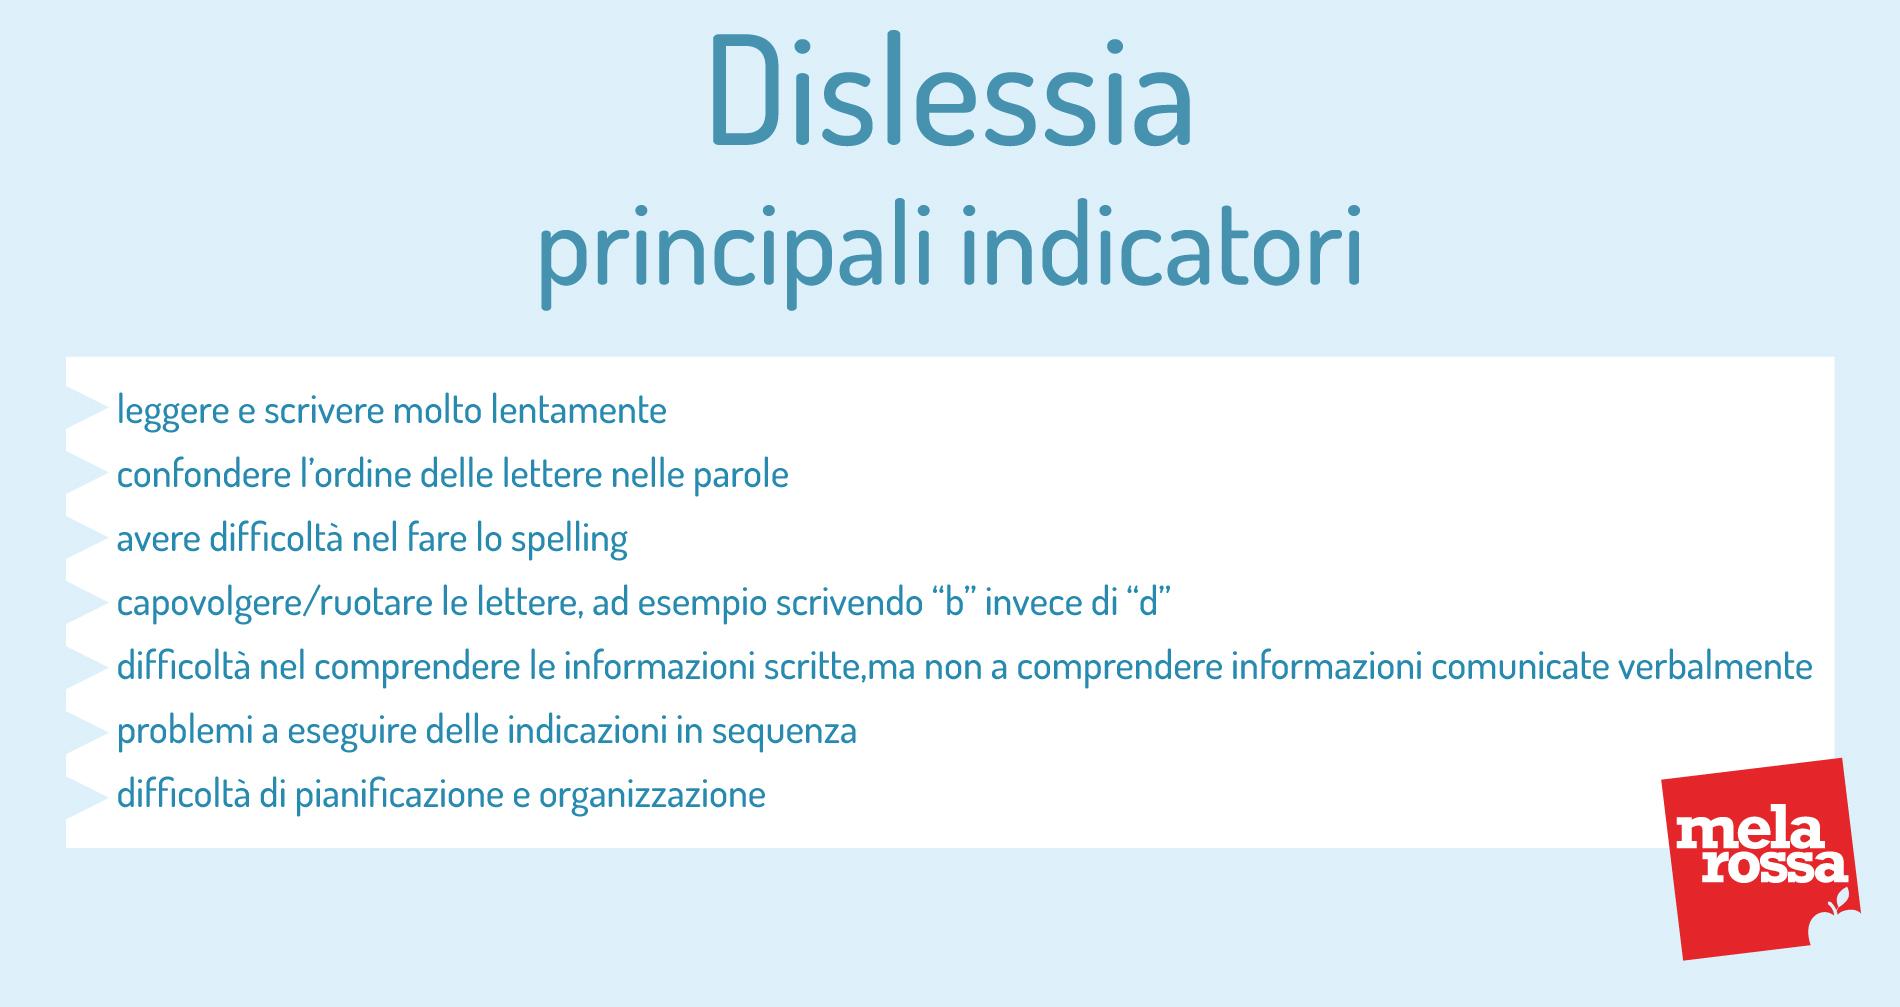 dislessia: principali indicatori